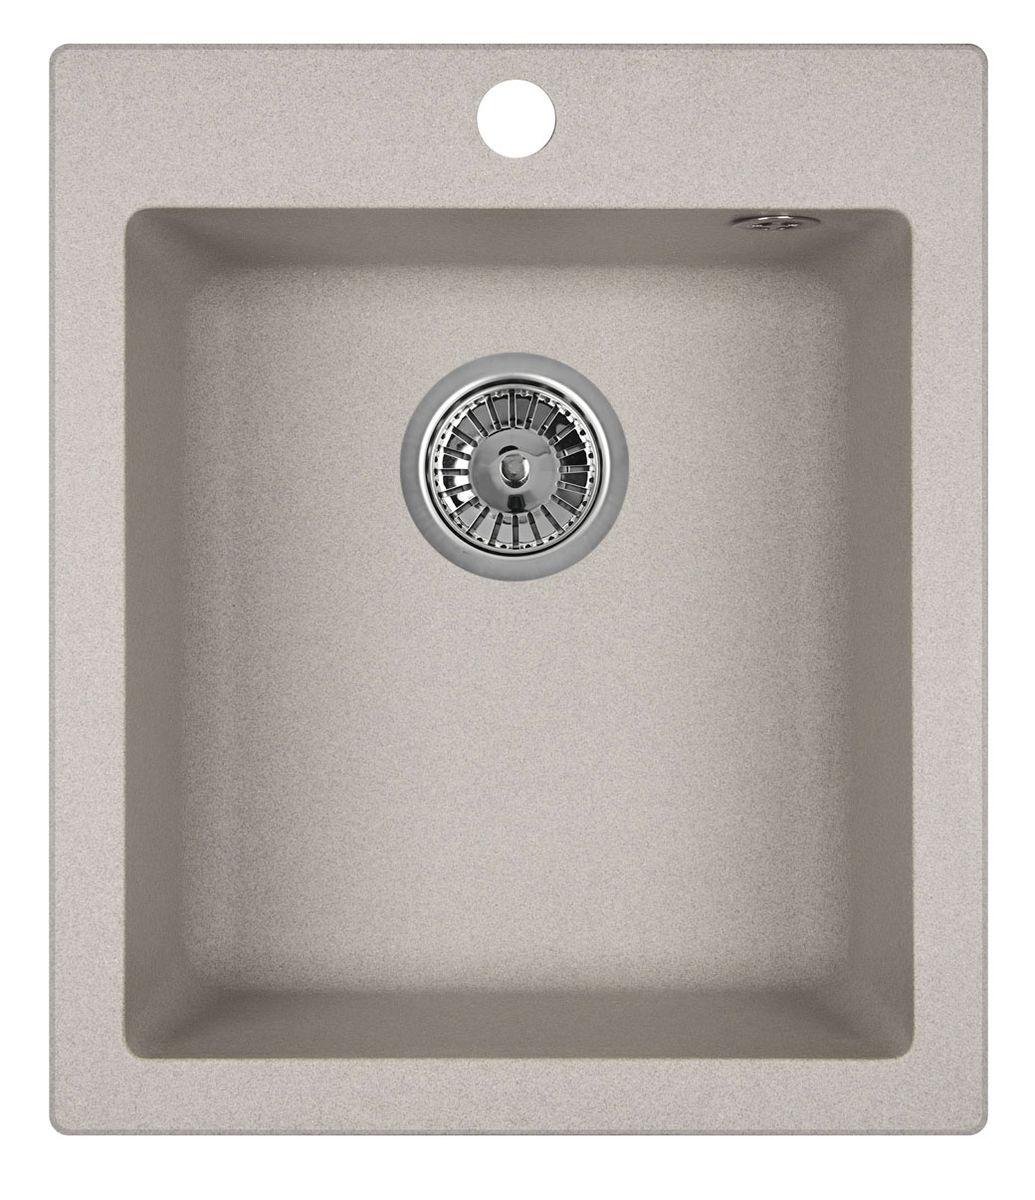 "Мойка Weissgauff ""Quadro 420 Eco Granit"", цвет: серый, 41,5 х 19,5 х 49,0 см 306175"